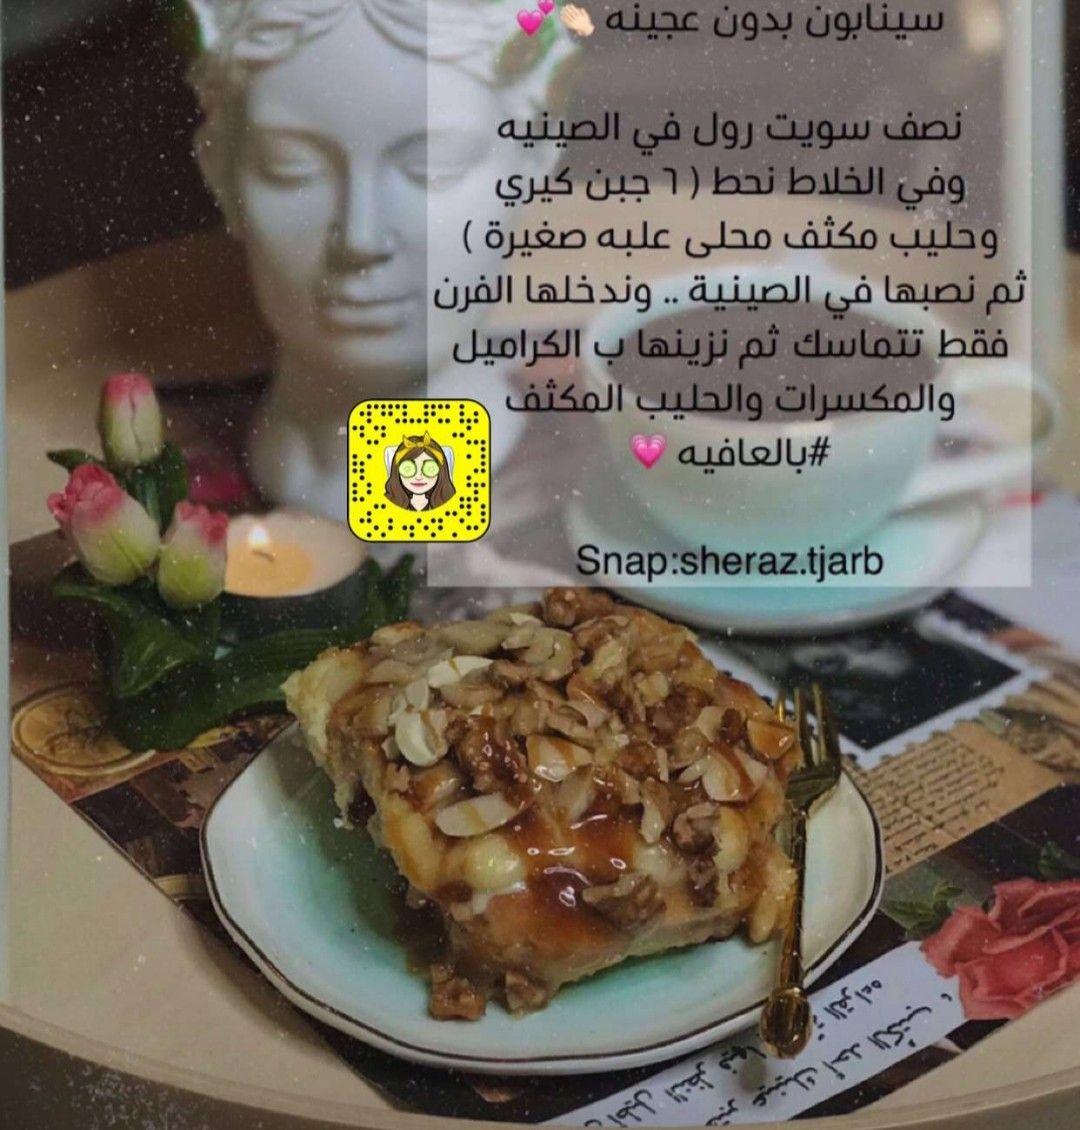 Pin By Asma Alotaibi On طبخ Food Desserts Ipl